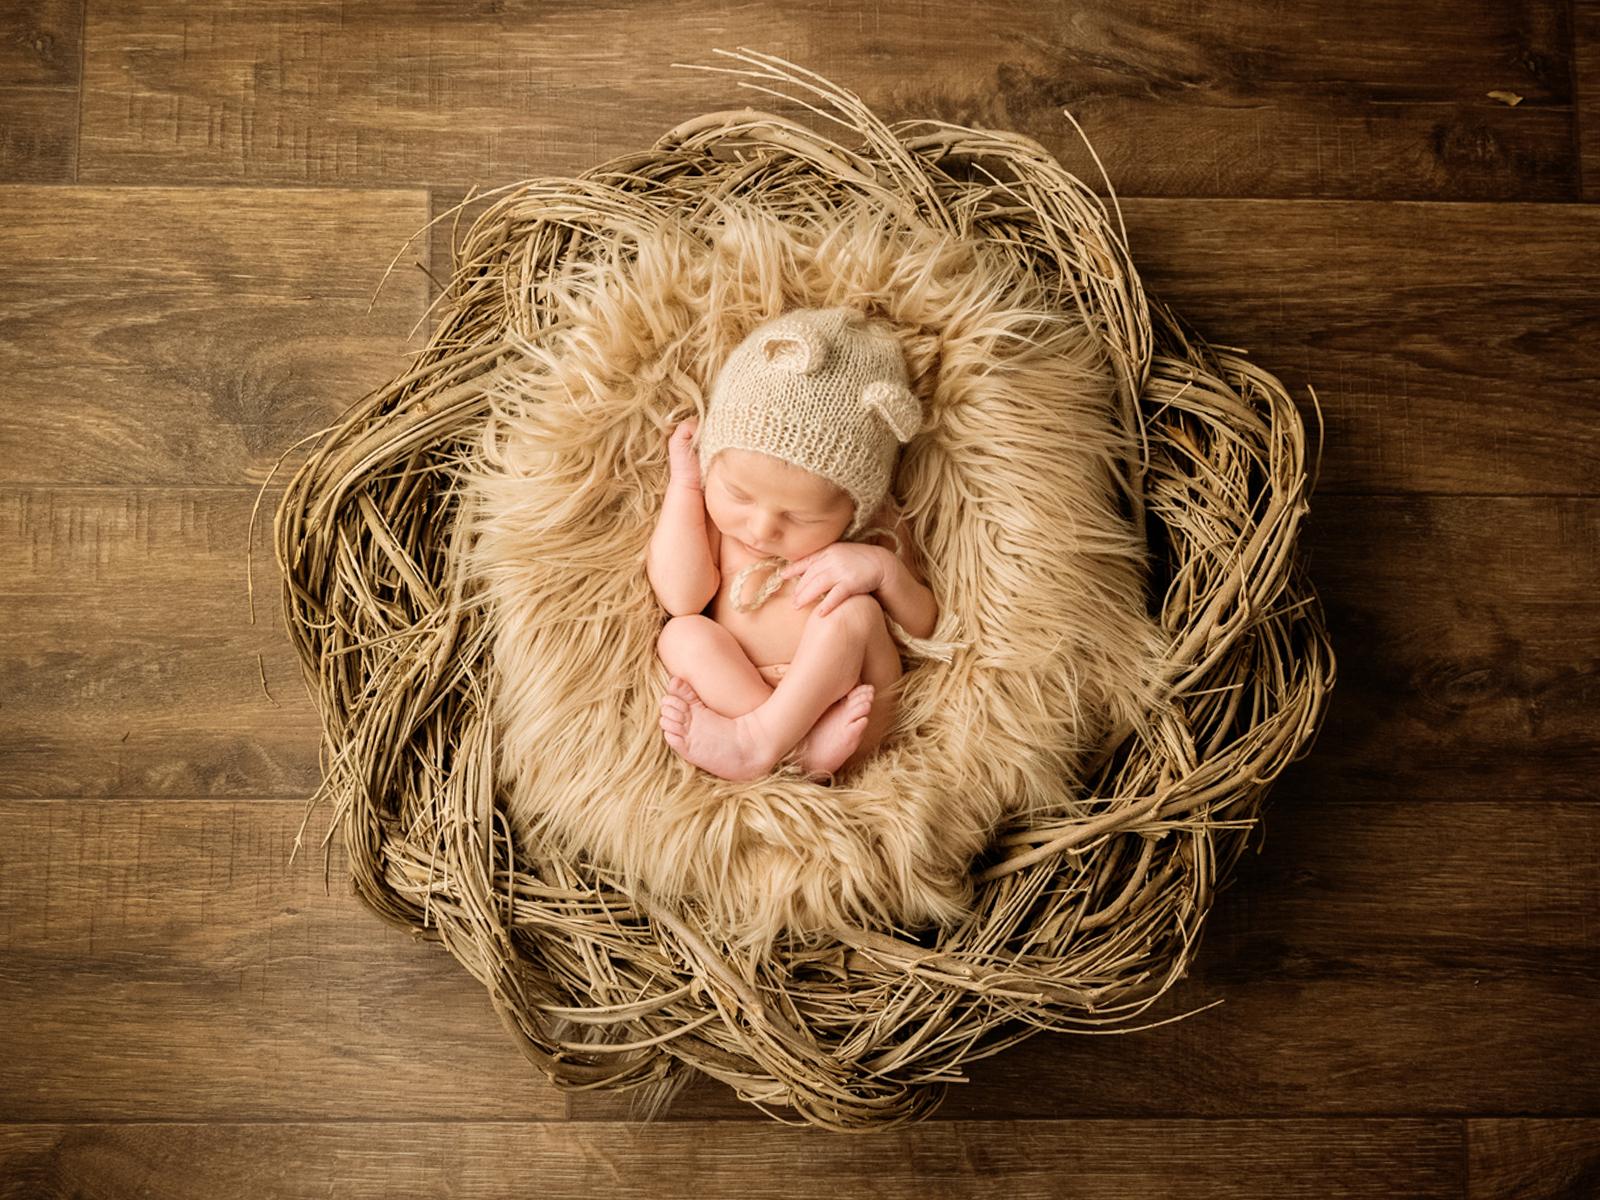 newborn-photography-art0012.jpg